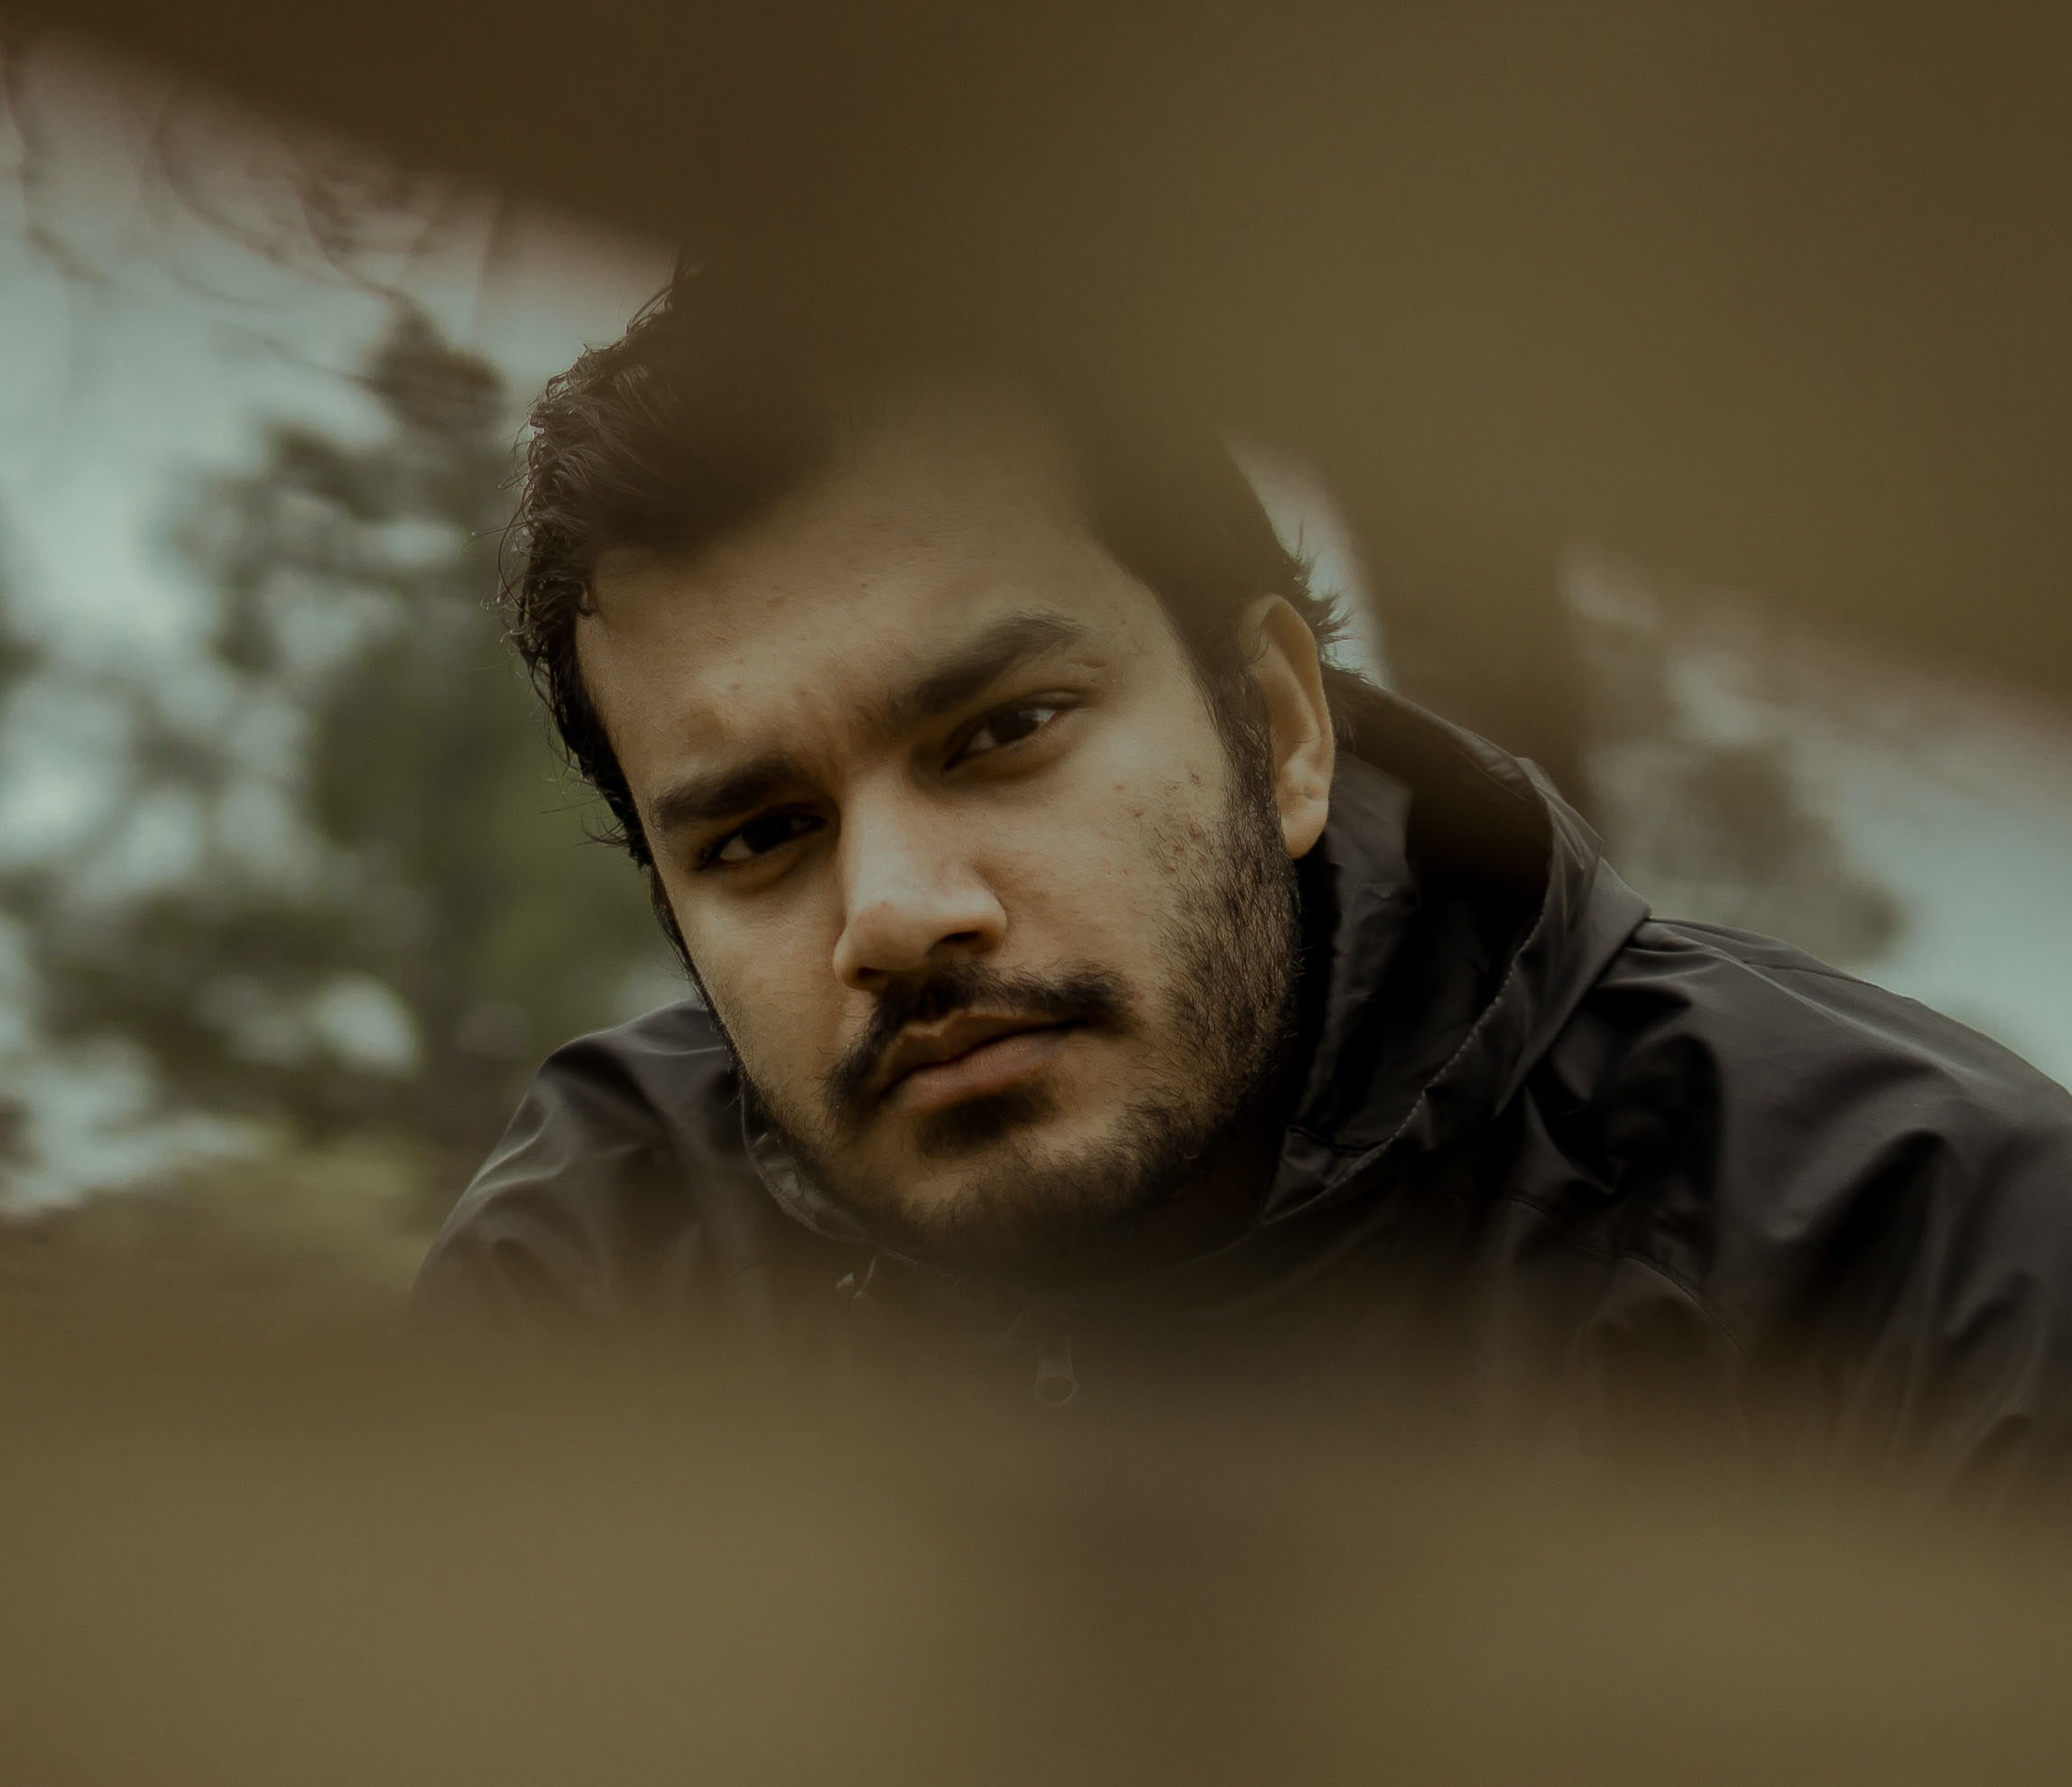 Go to Nouman Raees's profile